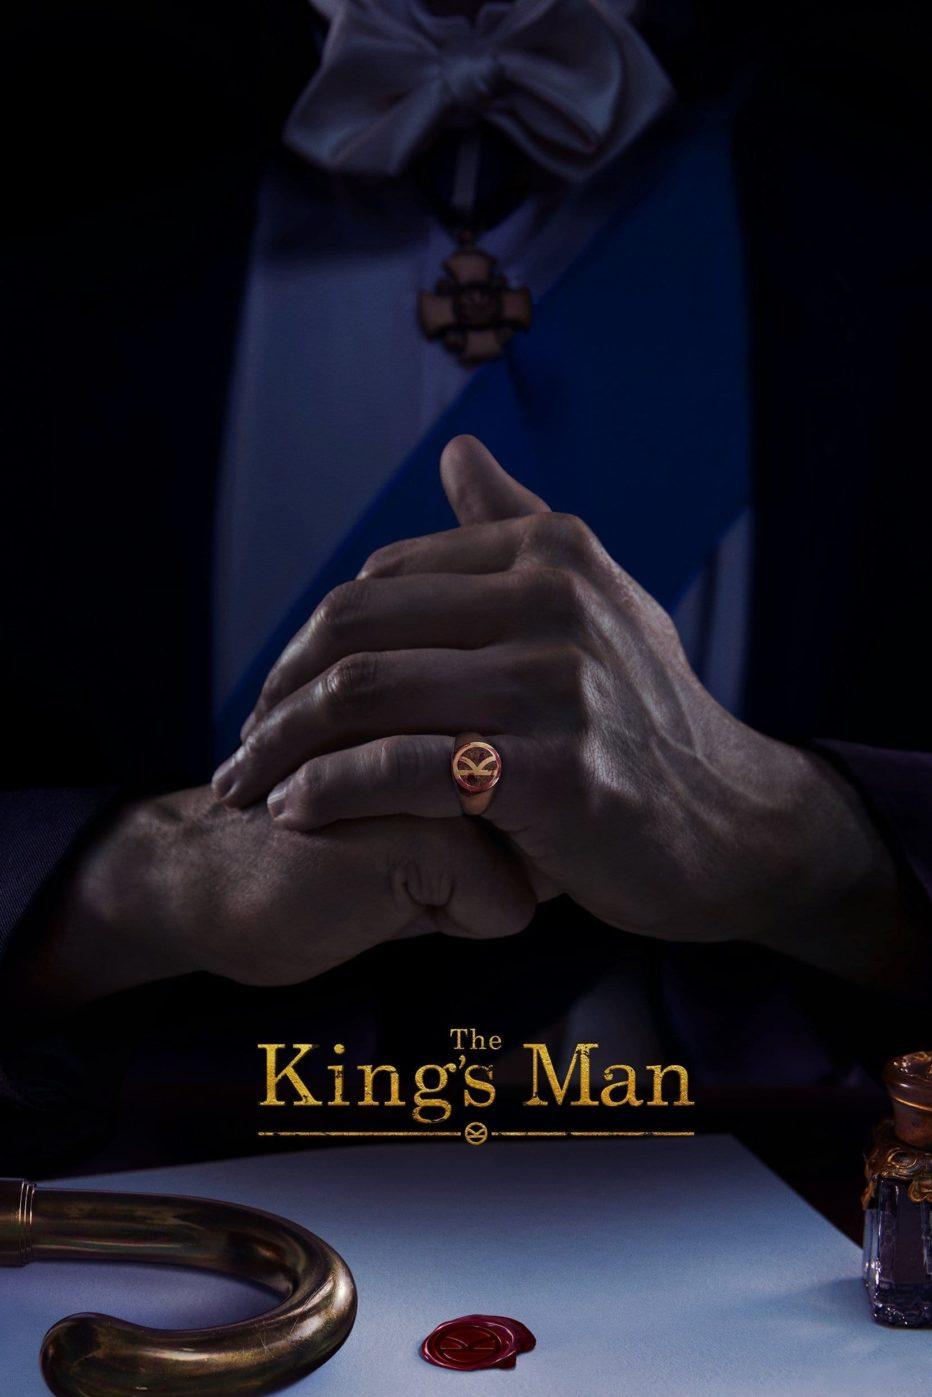 Primer trailer de The King's man, la precuela de Kingsman